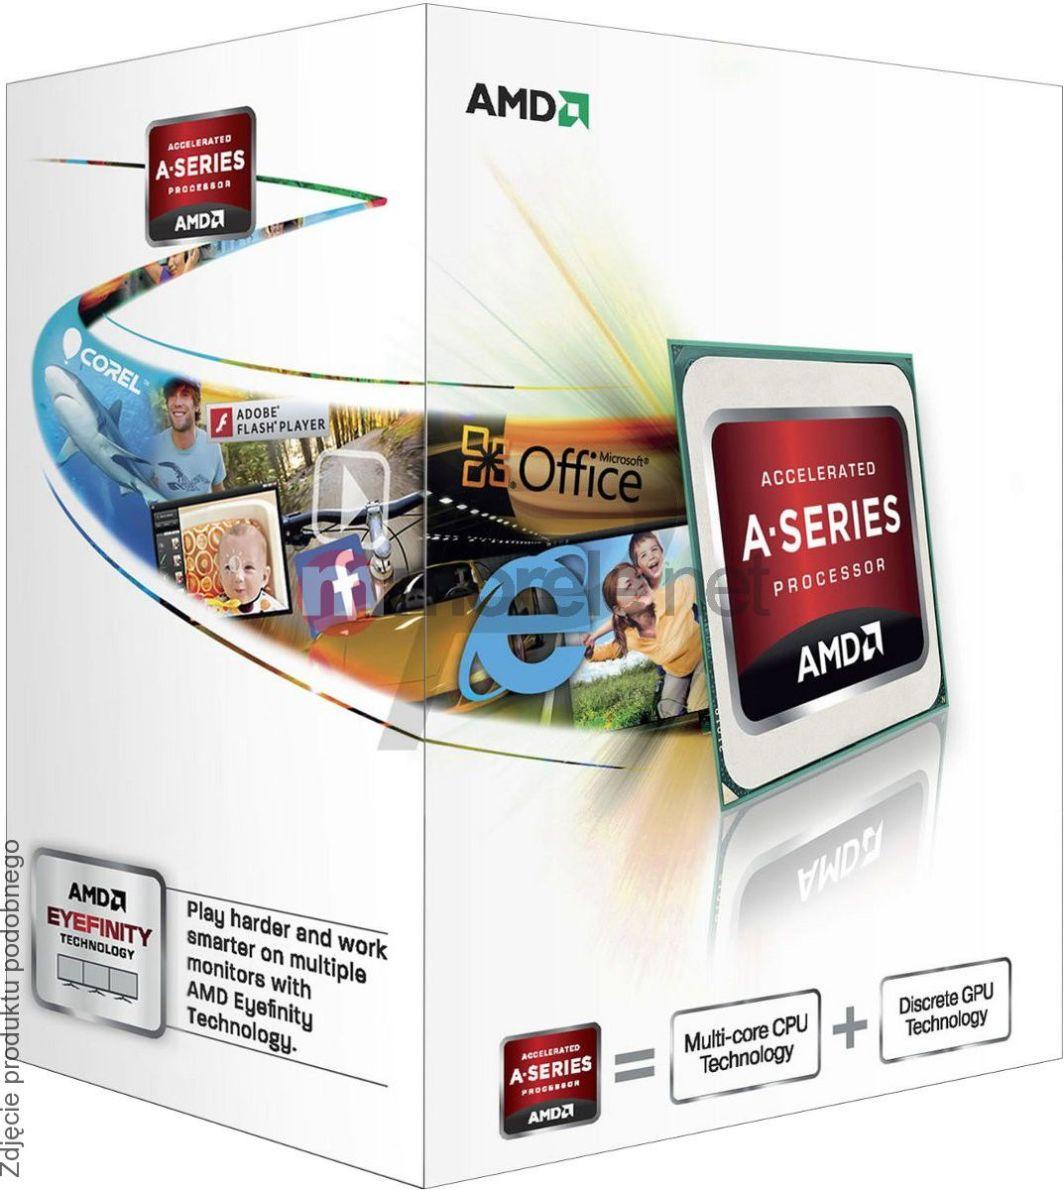 AMD A-Series A4-5300B 3.4GHz Socket FM2 Desktop CPU AD530BOKA23HJ